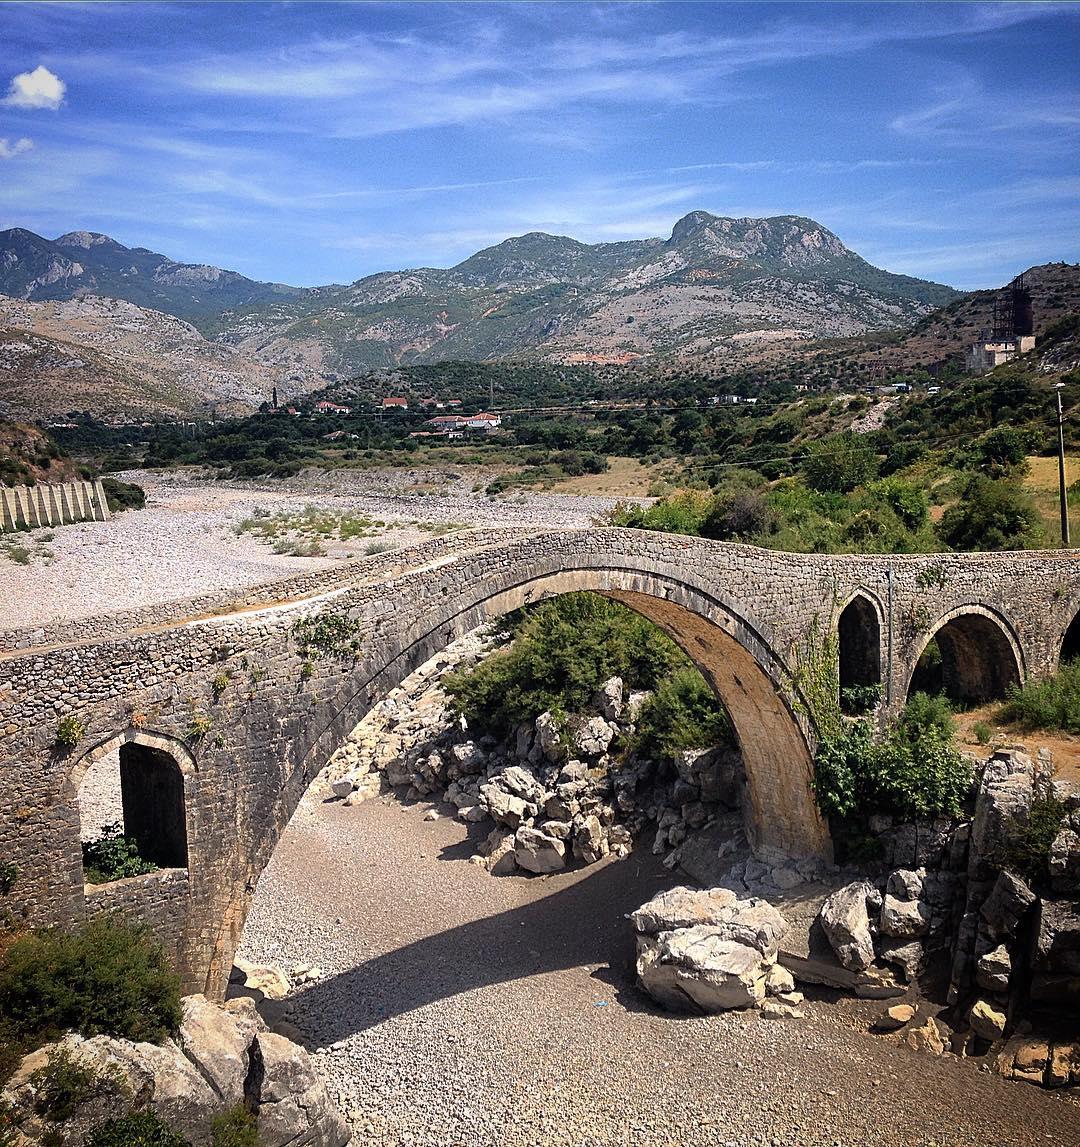 The 18th century Ottoman Mes Bridge